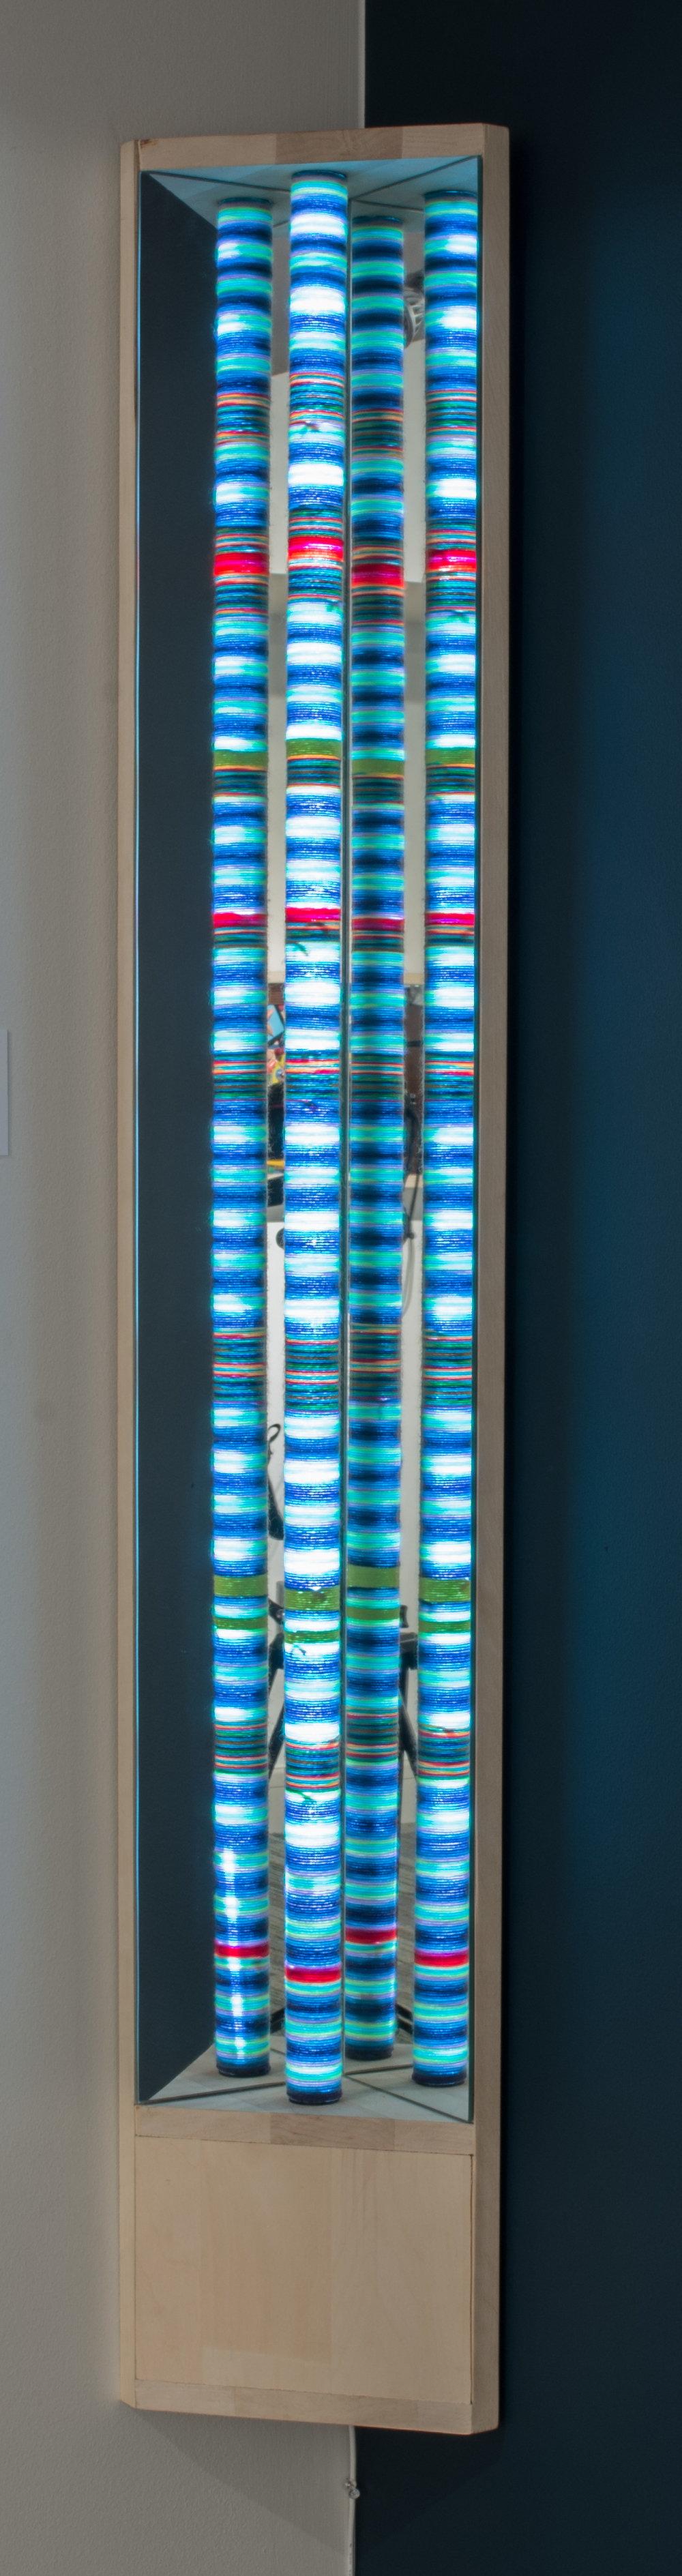 Hallie Beams: Cool Corner - Mixed Media55″ x 7″ x 10.5